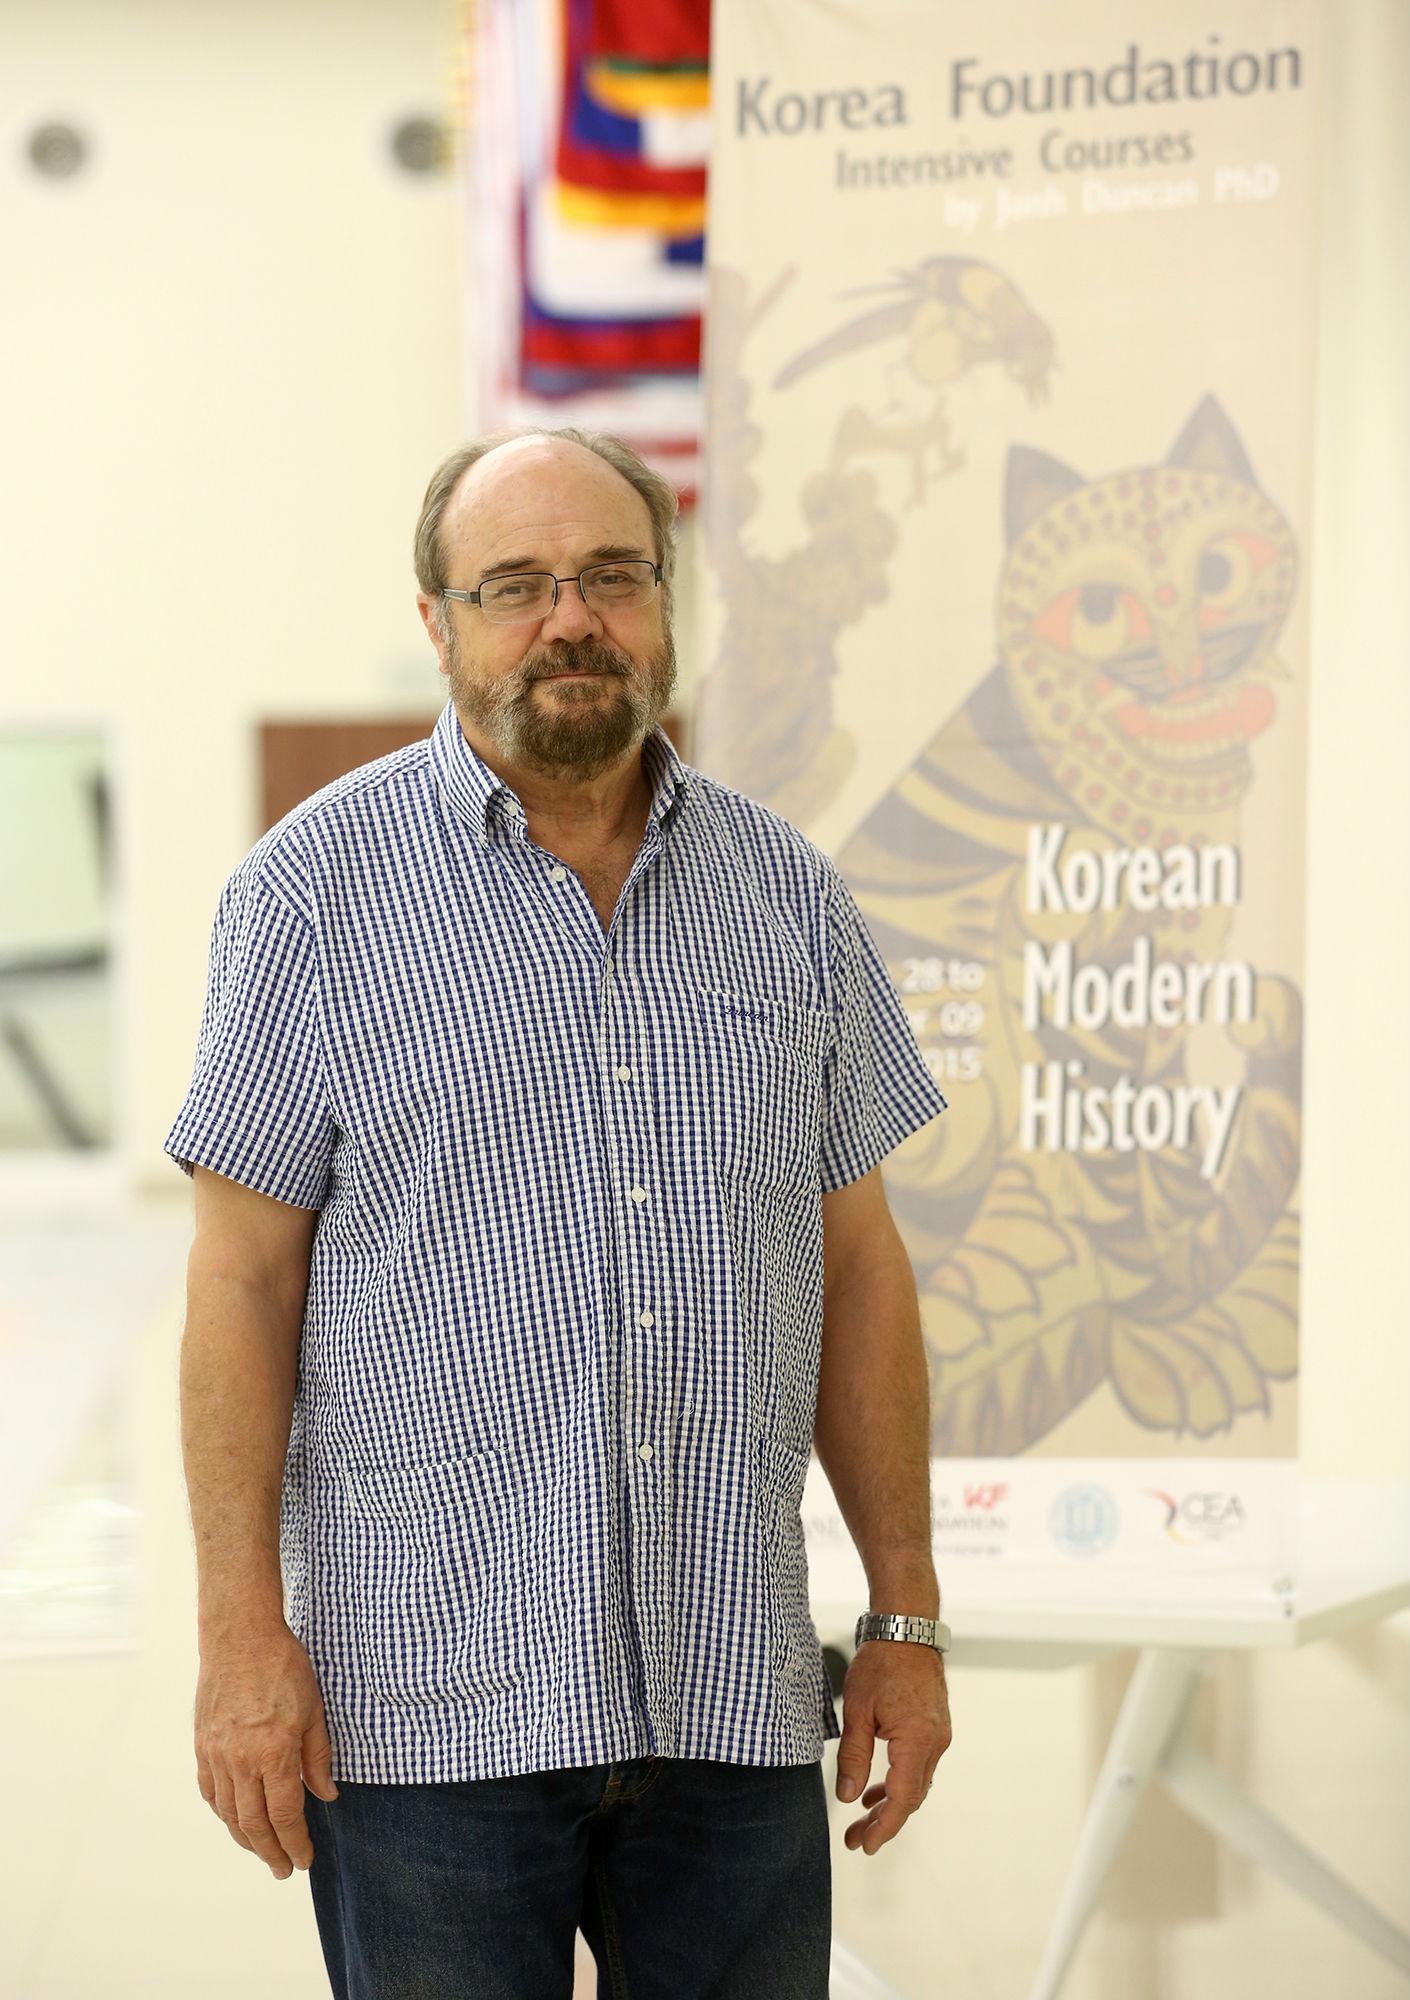 Korean Modern History